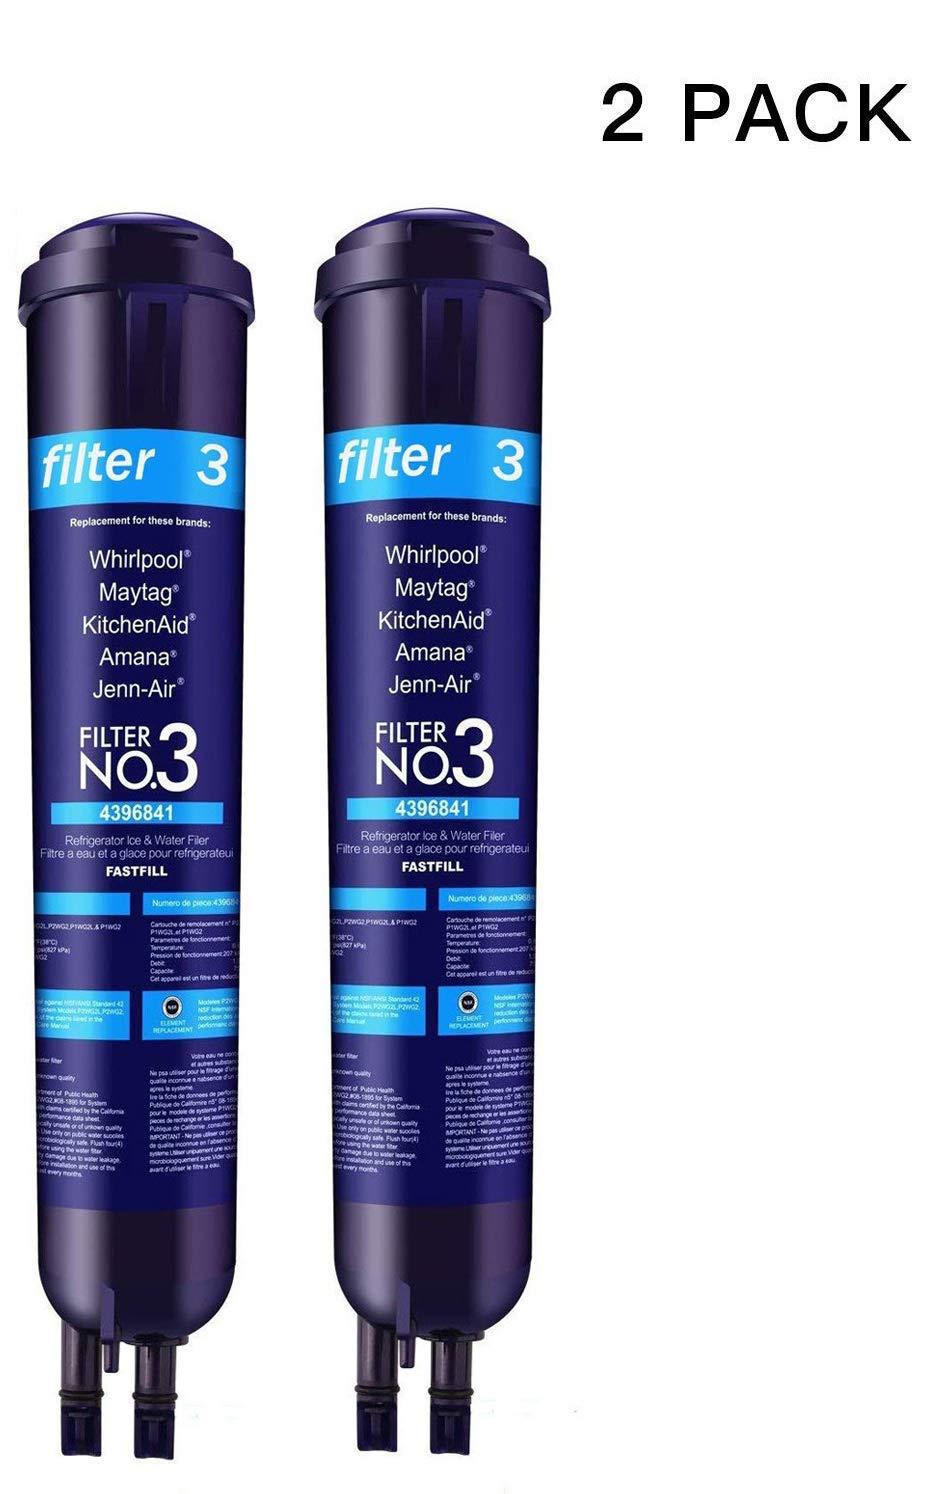 SHJZSY Refrigerator Water Filter3 4396841 EDR3 RXD1 4396710 9030 Filter3 (2pack)